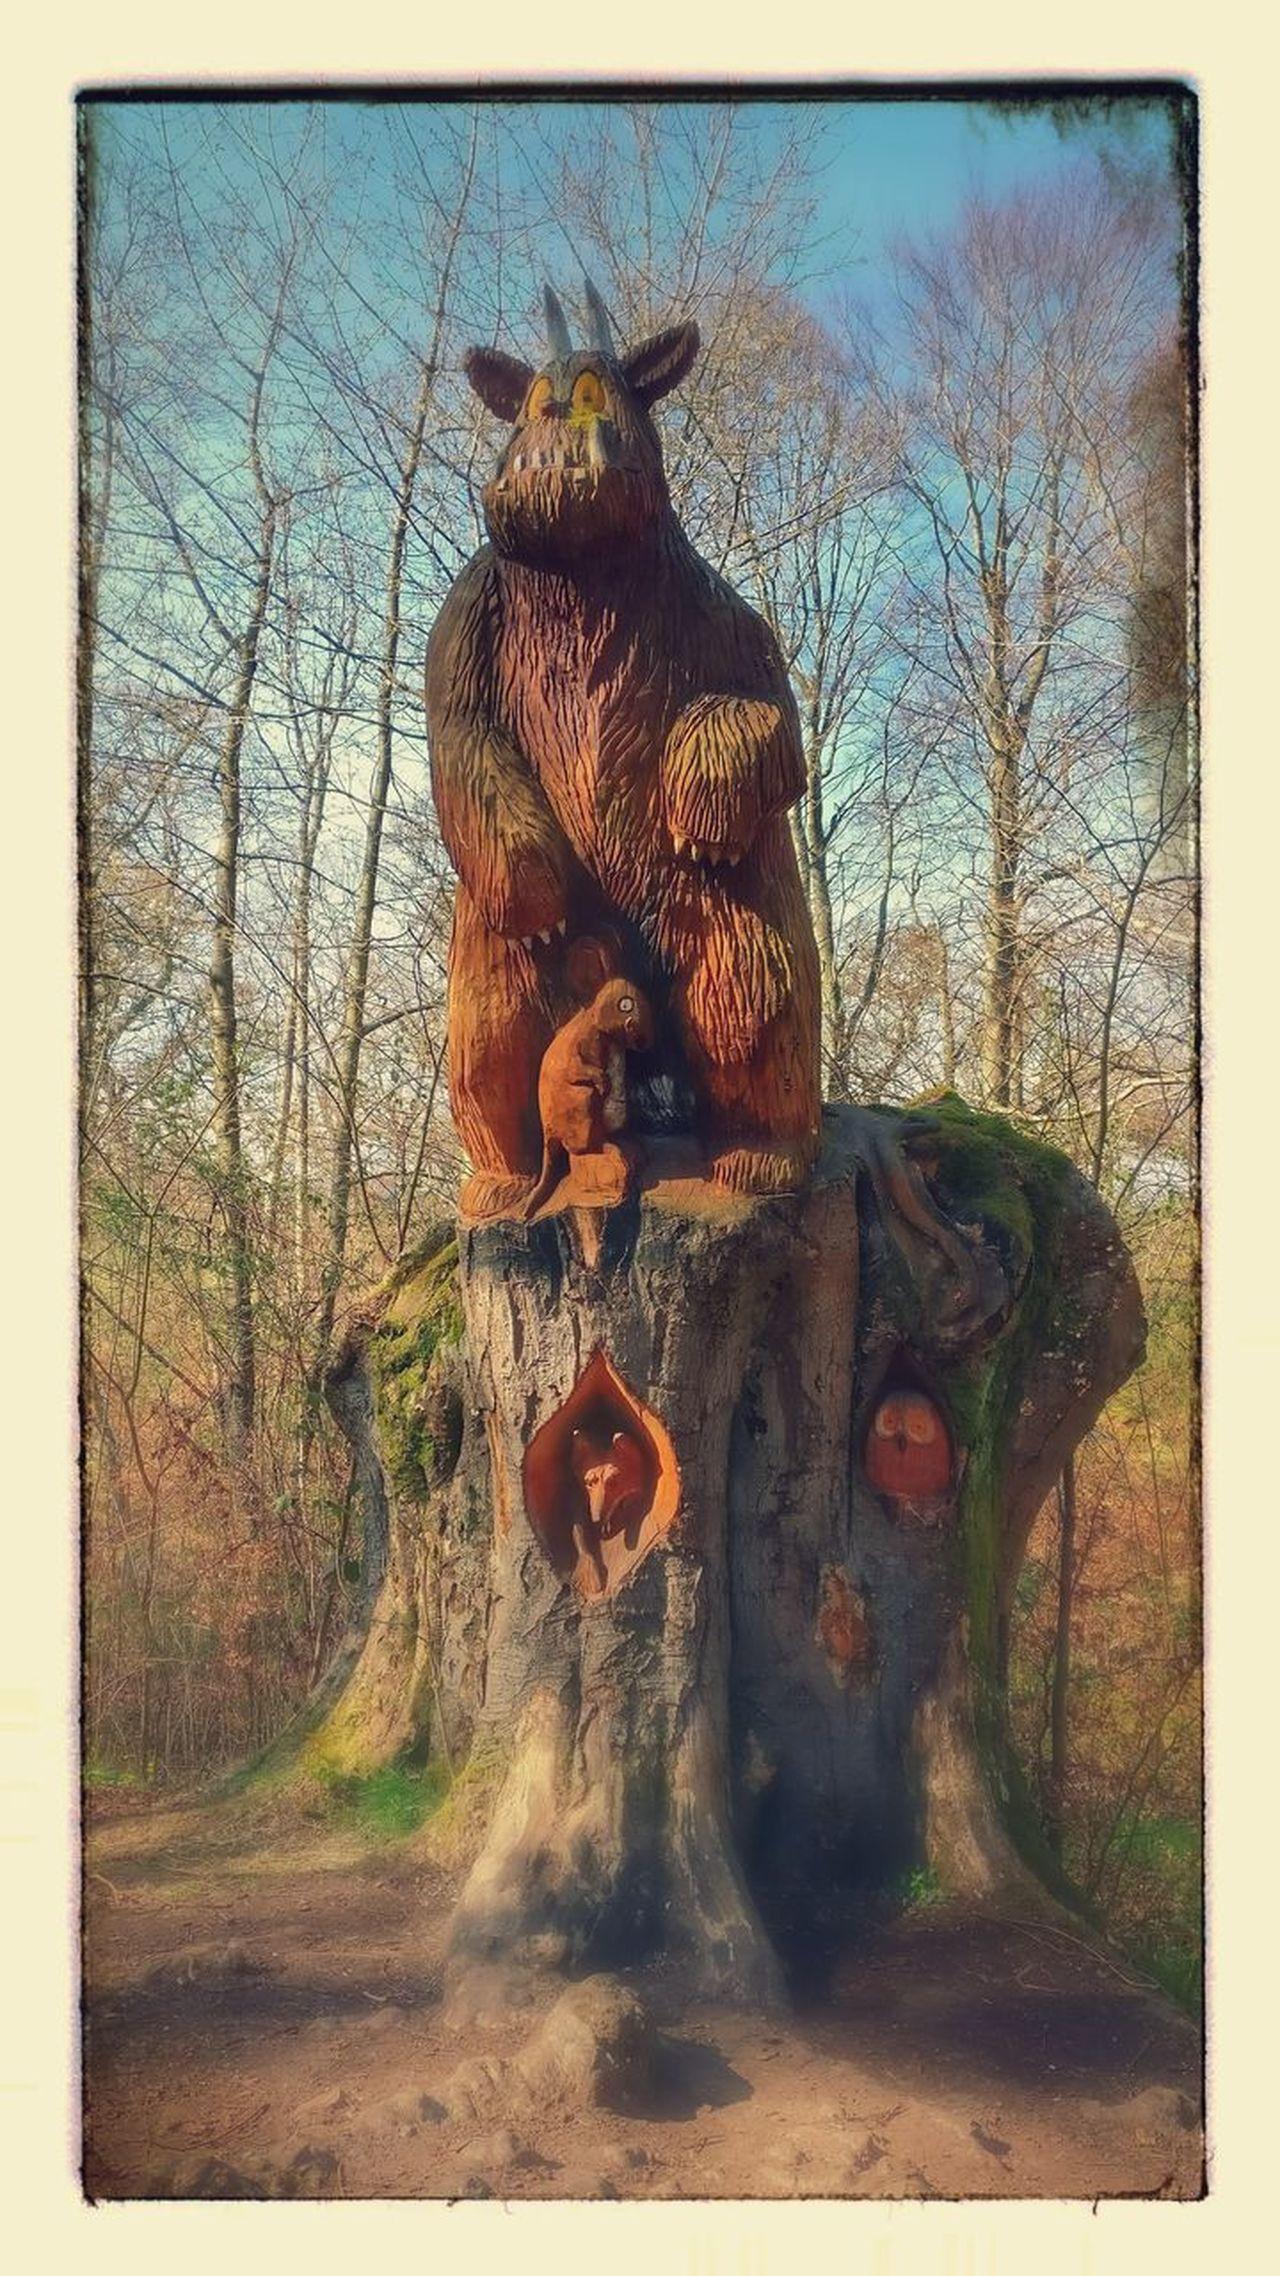 No People Statue Gruffalo Hunt Gruffalo Highlands Scottish Scotland 💕 Scotlandsbeauty Full Frame Mammal Animals In The Wild Wood Carving Art Culloden Scottish Highlands Scotland Outdoors Statue